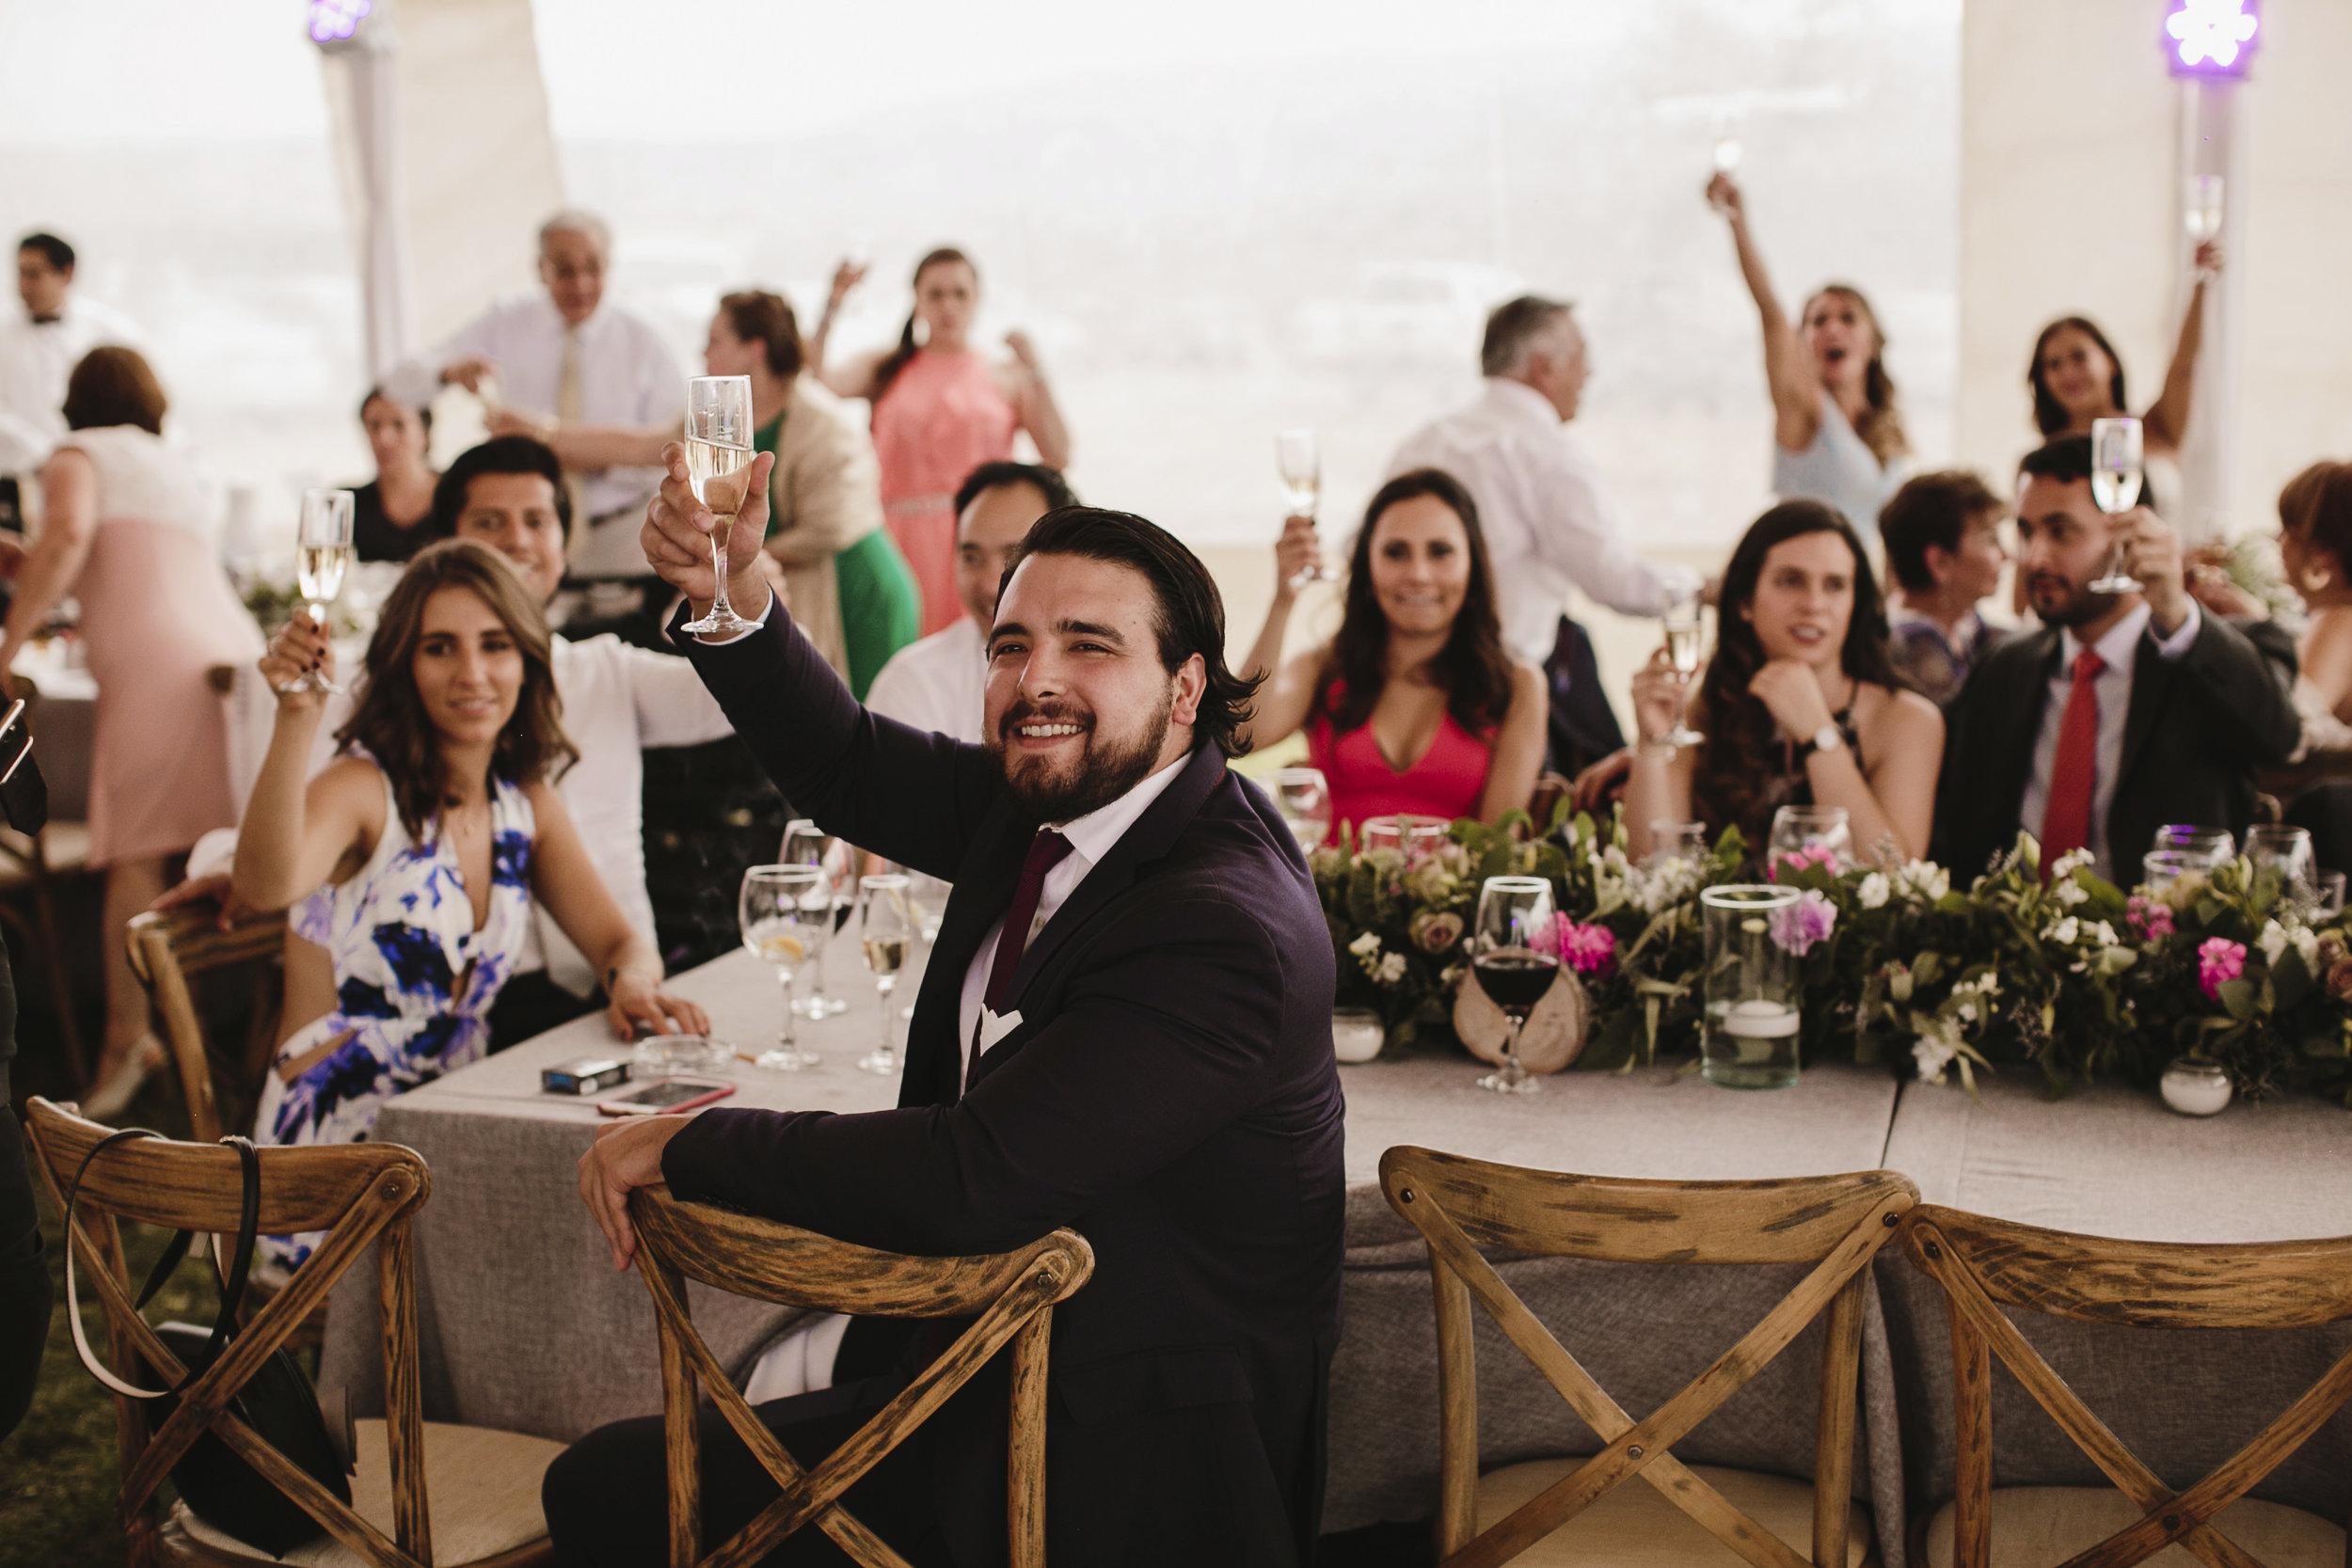 alfons_flores_destination_wedding_photography_mavi_david-1508.JPG